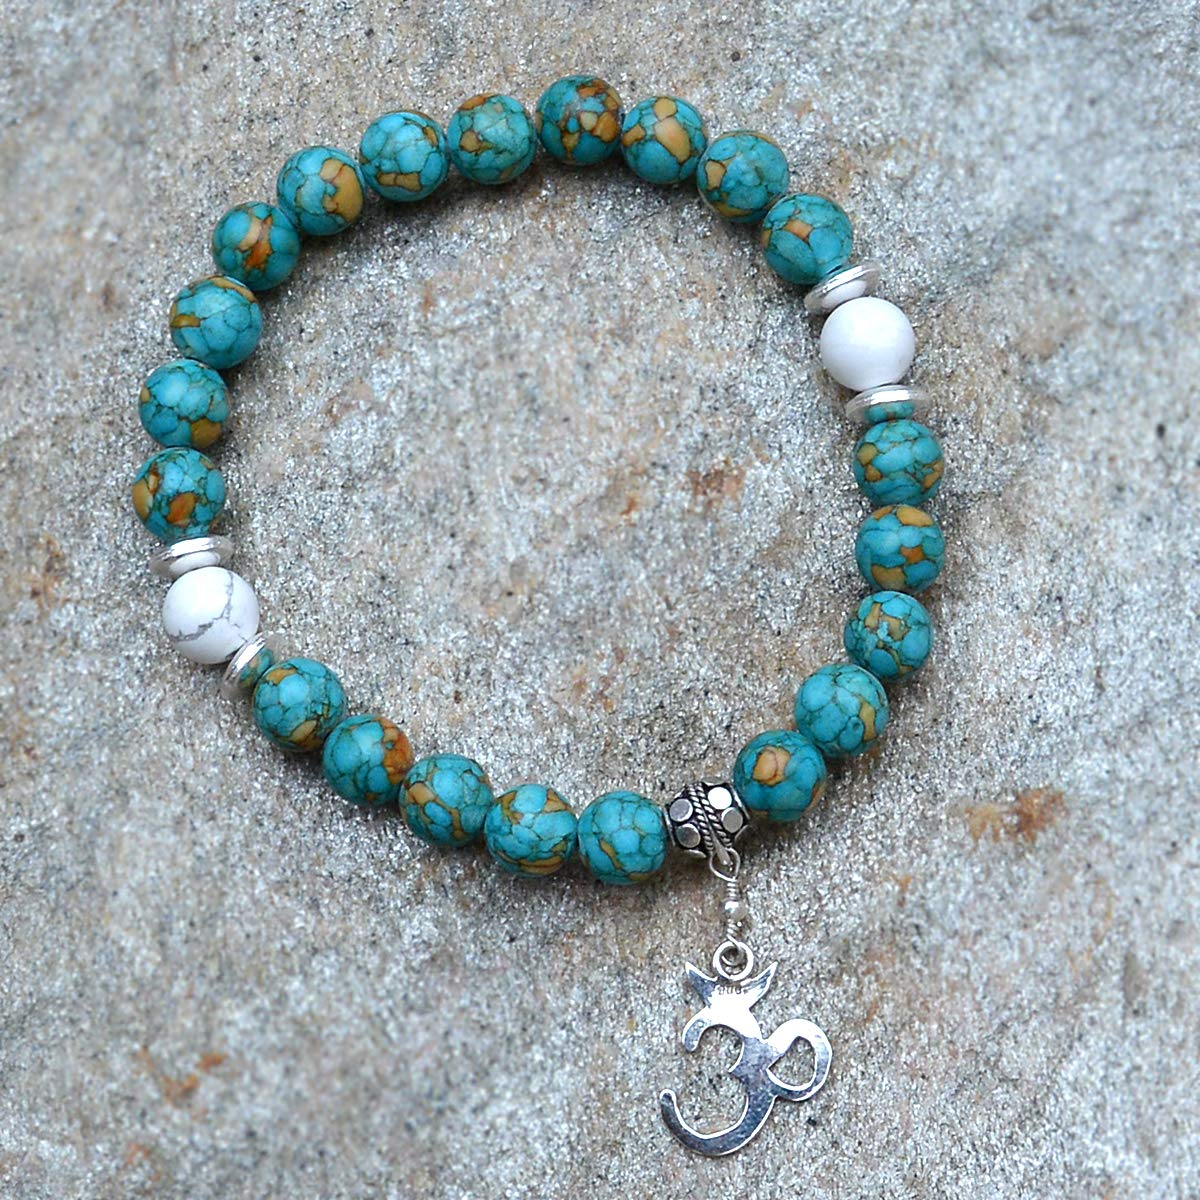 Saamarth Impex Turquoise /& Howlite 925 Sterling Silver Gemstone Stretchable Charm Bracelet PG-156018